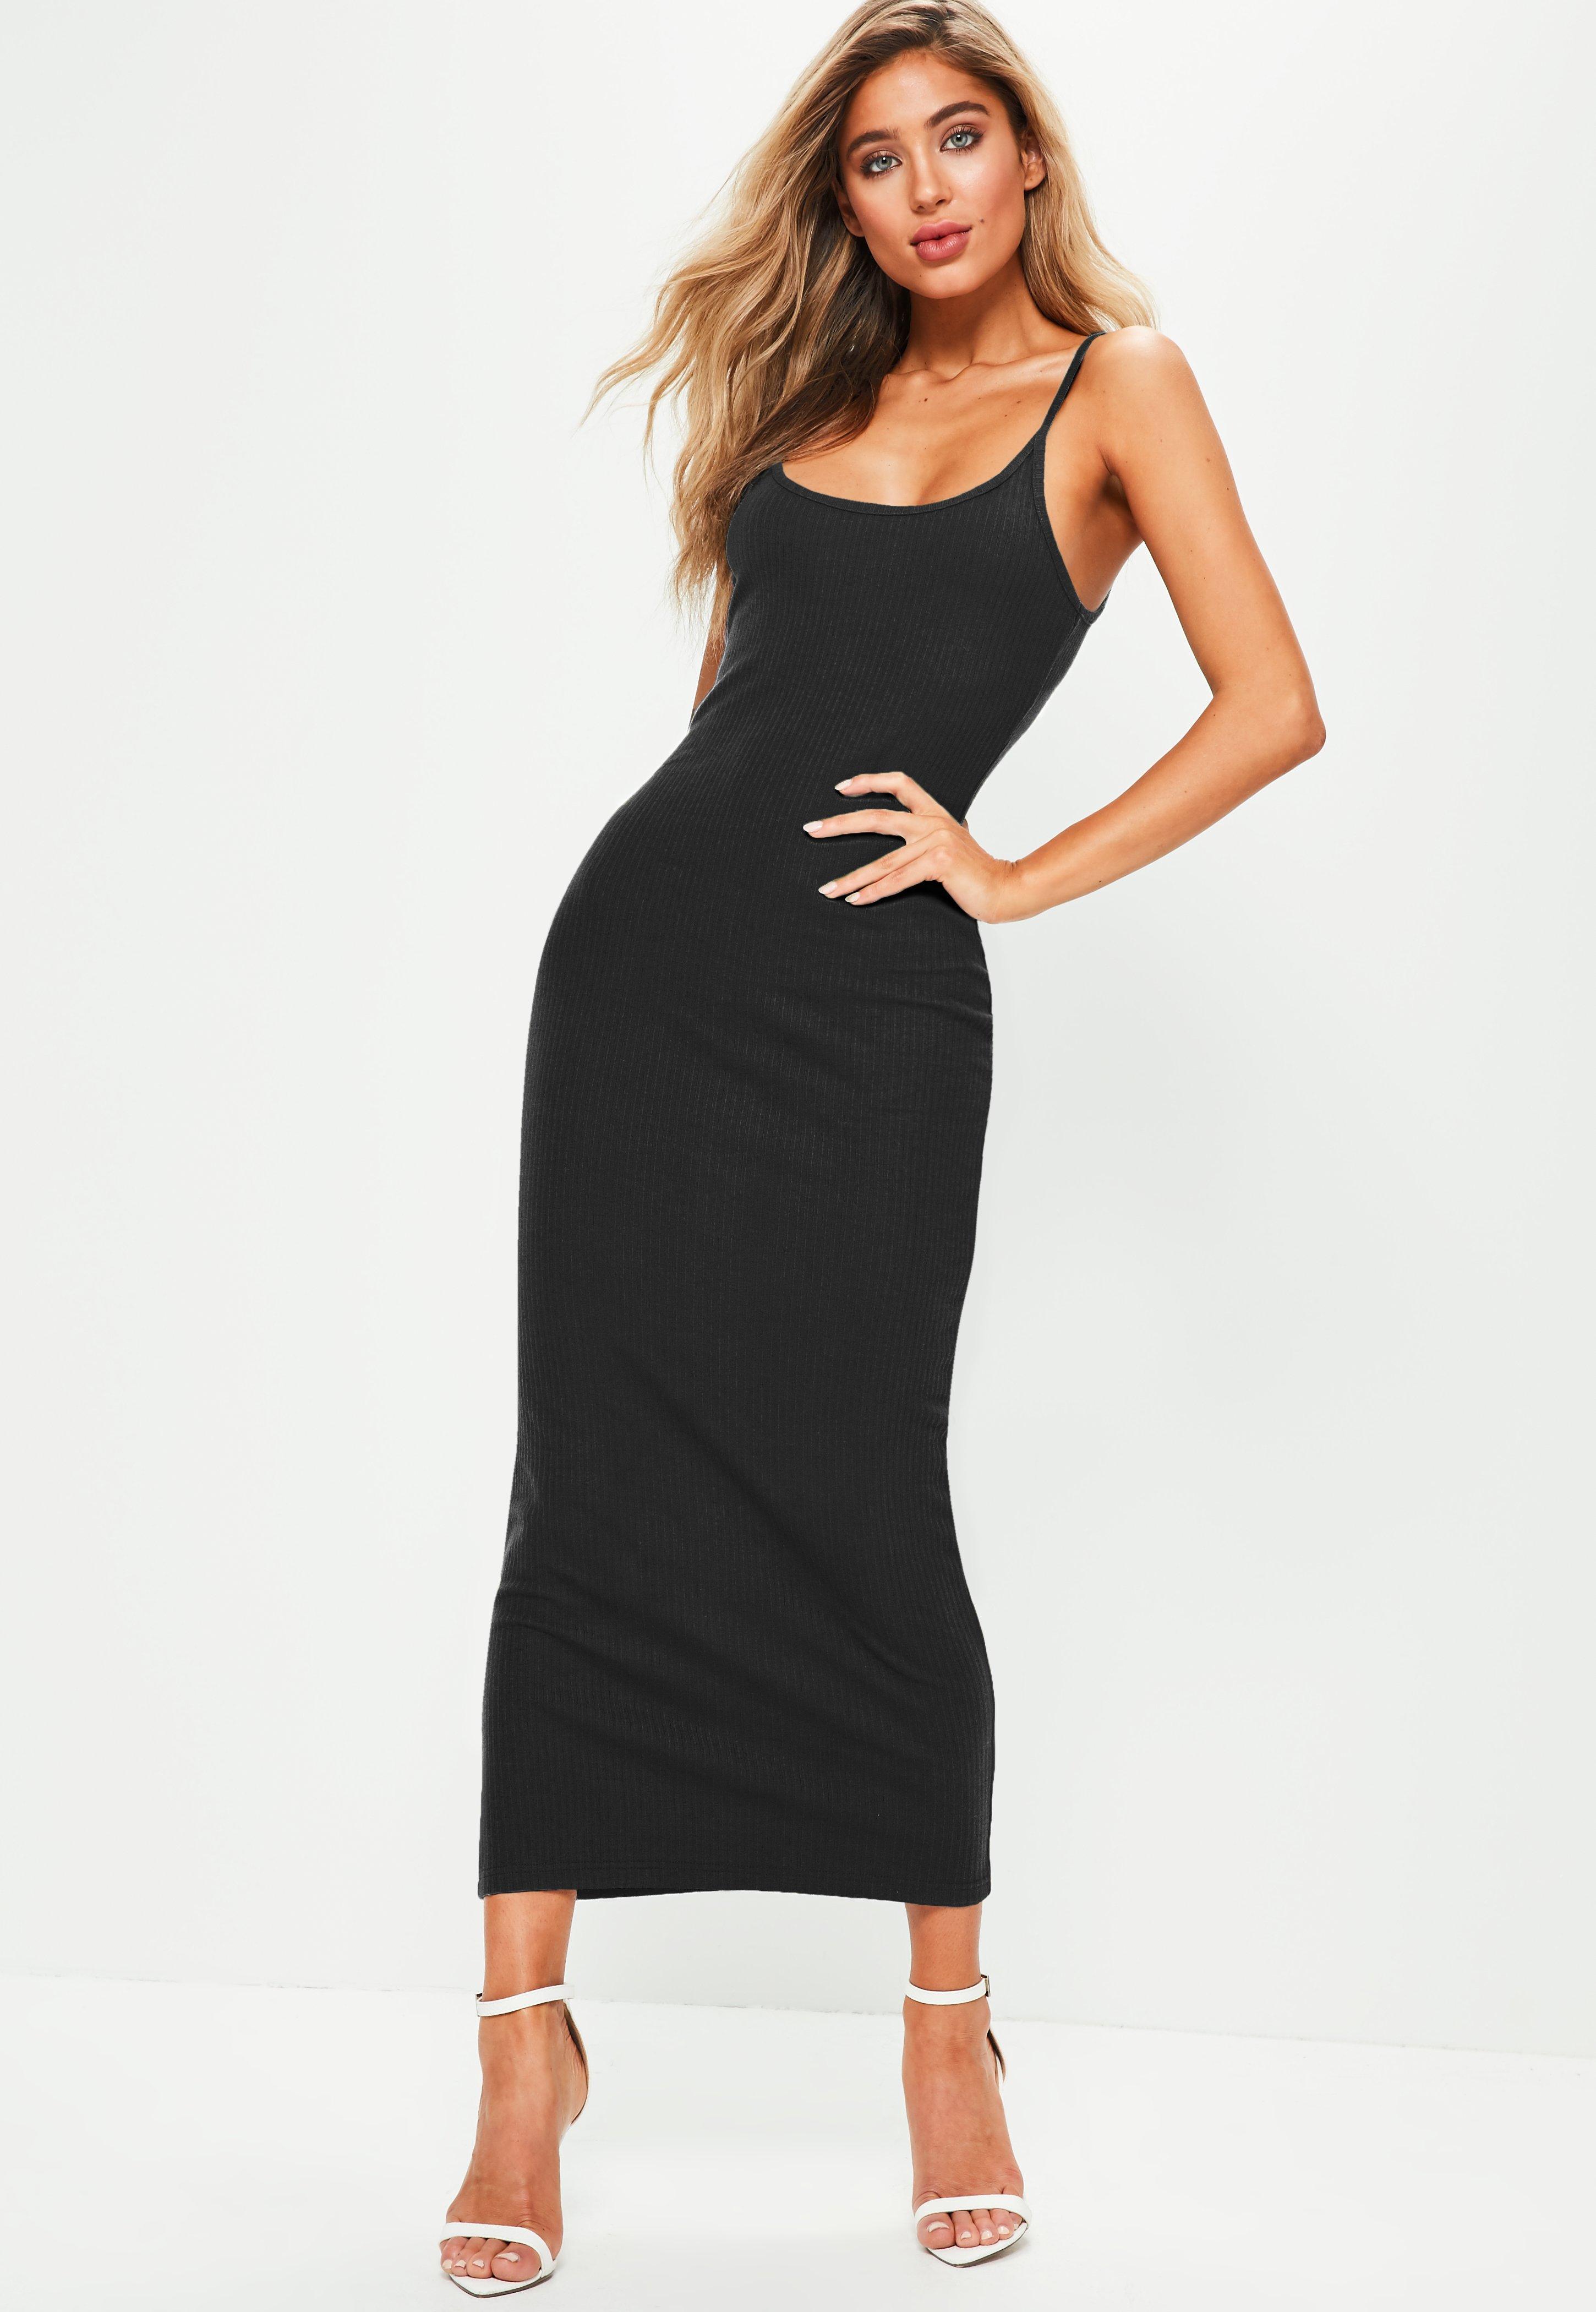 Maxi Dresses - Long & Short Sleeve Maxi Dresses | Missguided